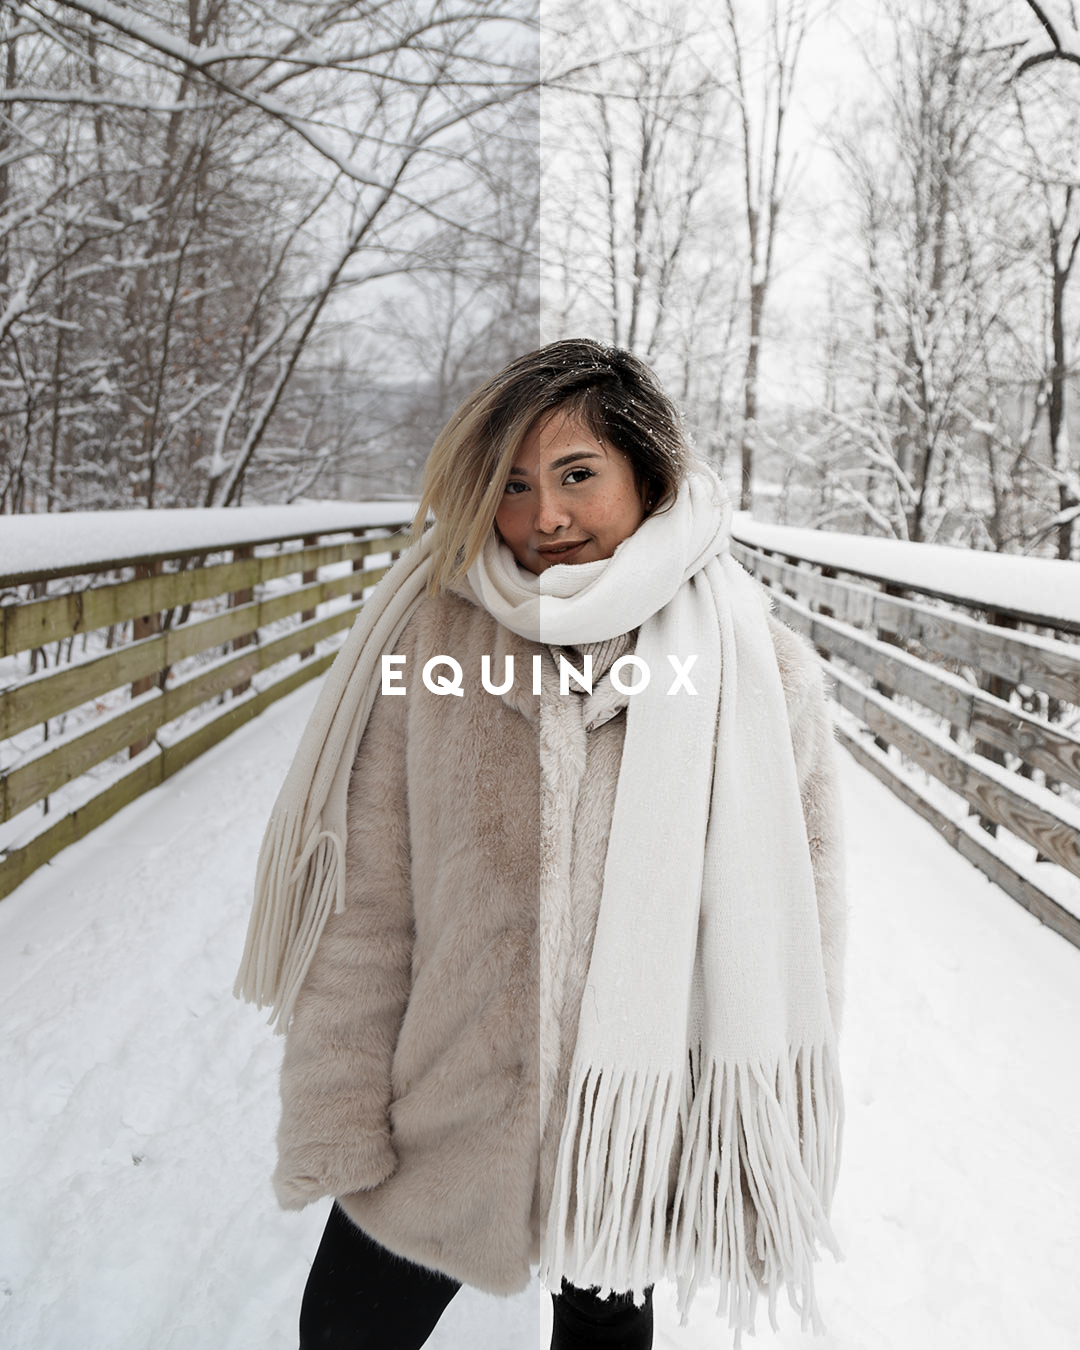 equinox1.png